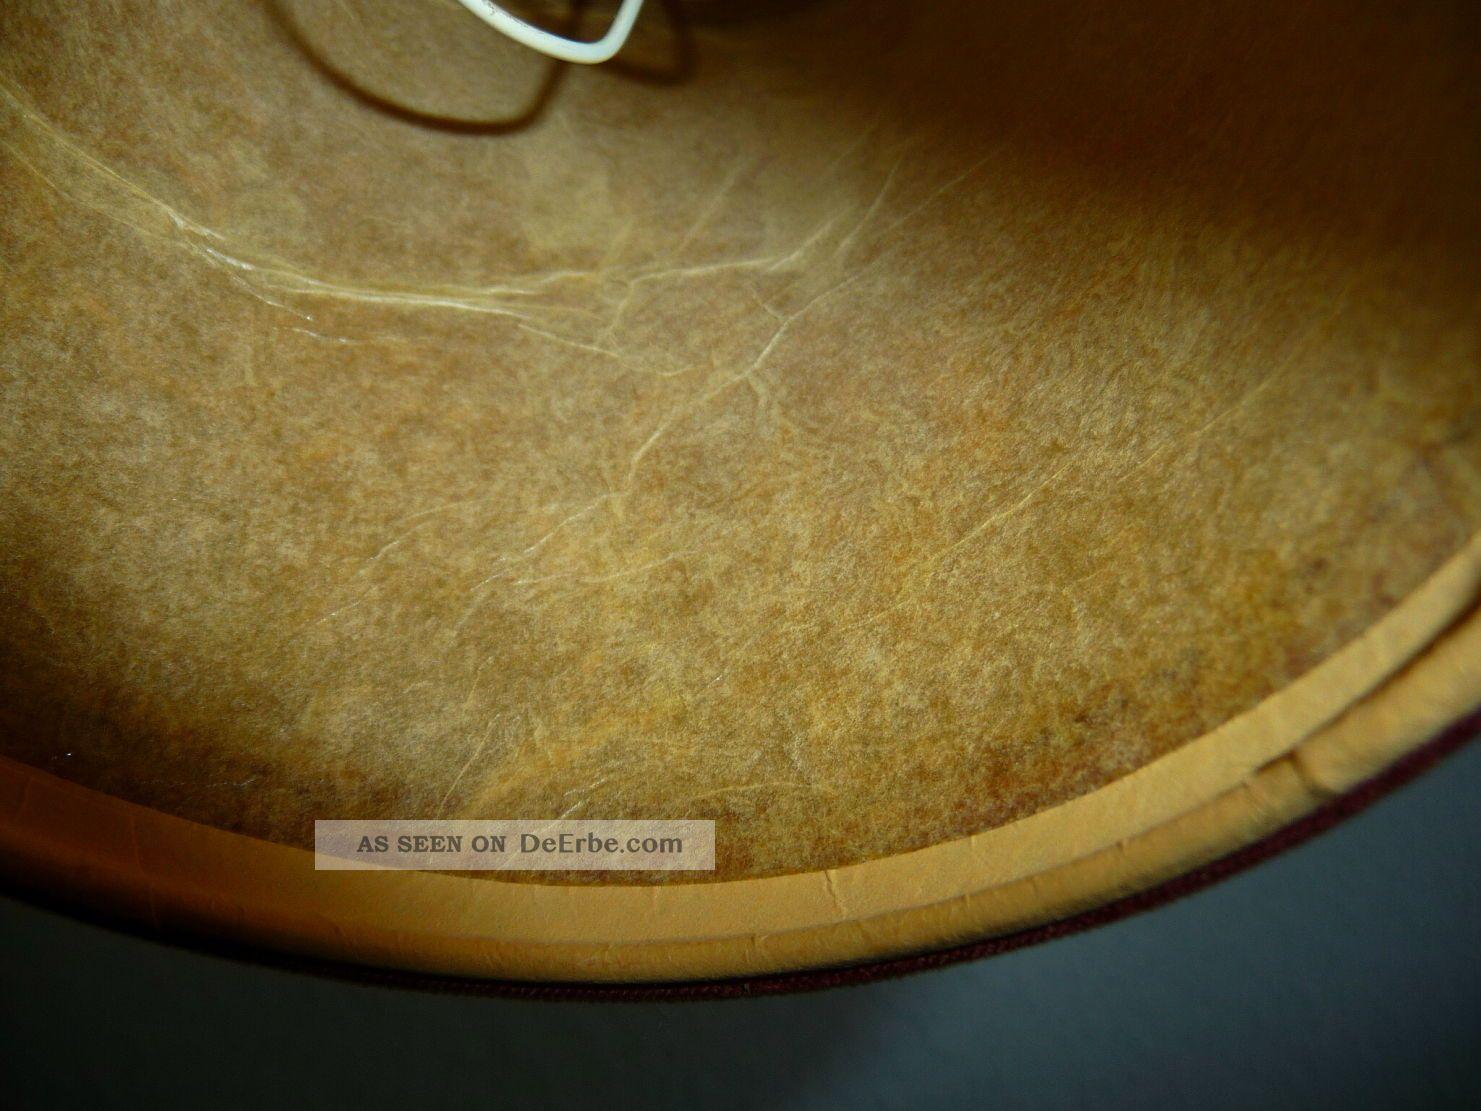 Lenschirm Pergament alter aufsteckschirm klemmschirm lenschirm pergament tierhaut